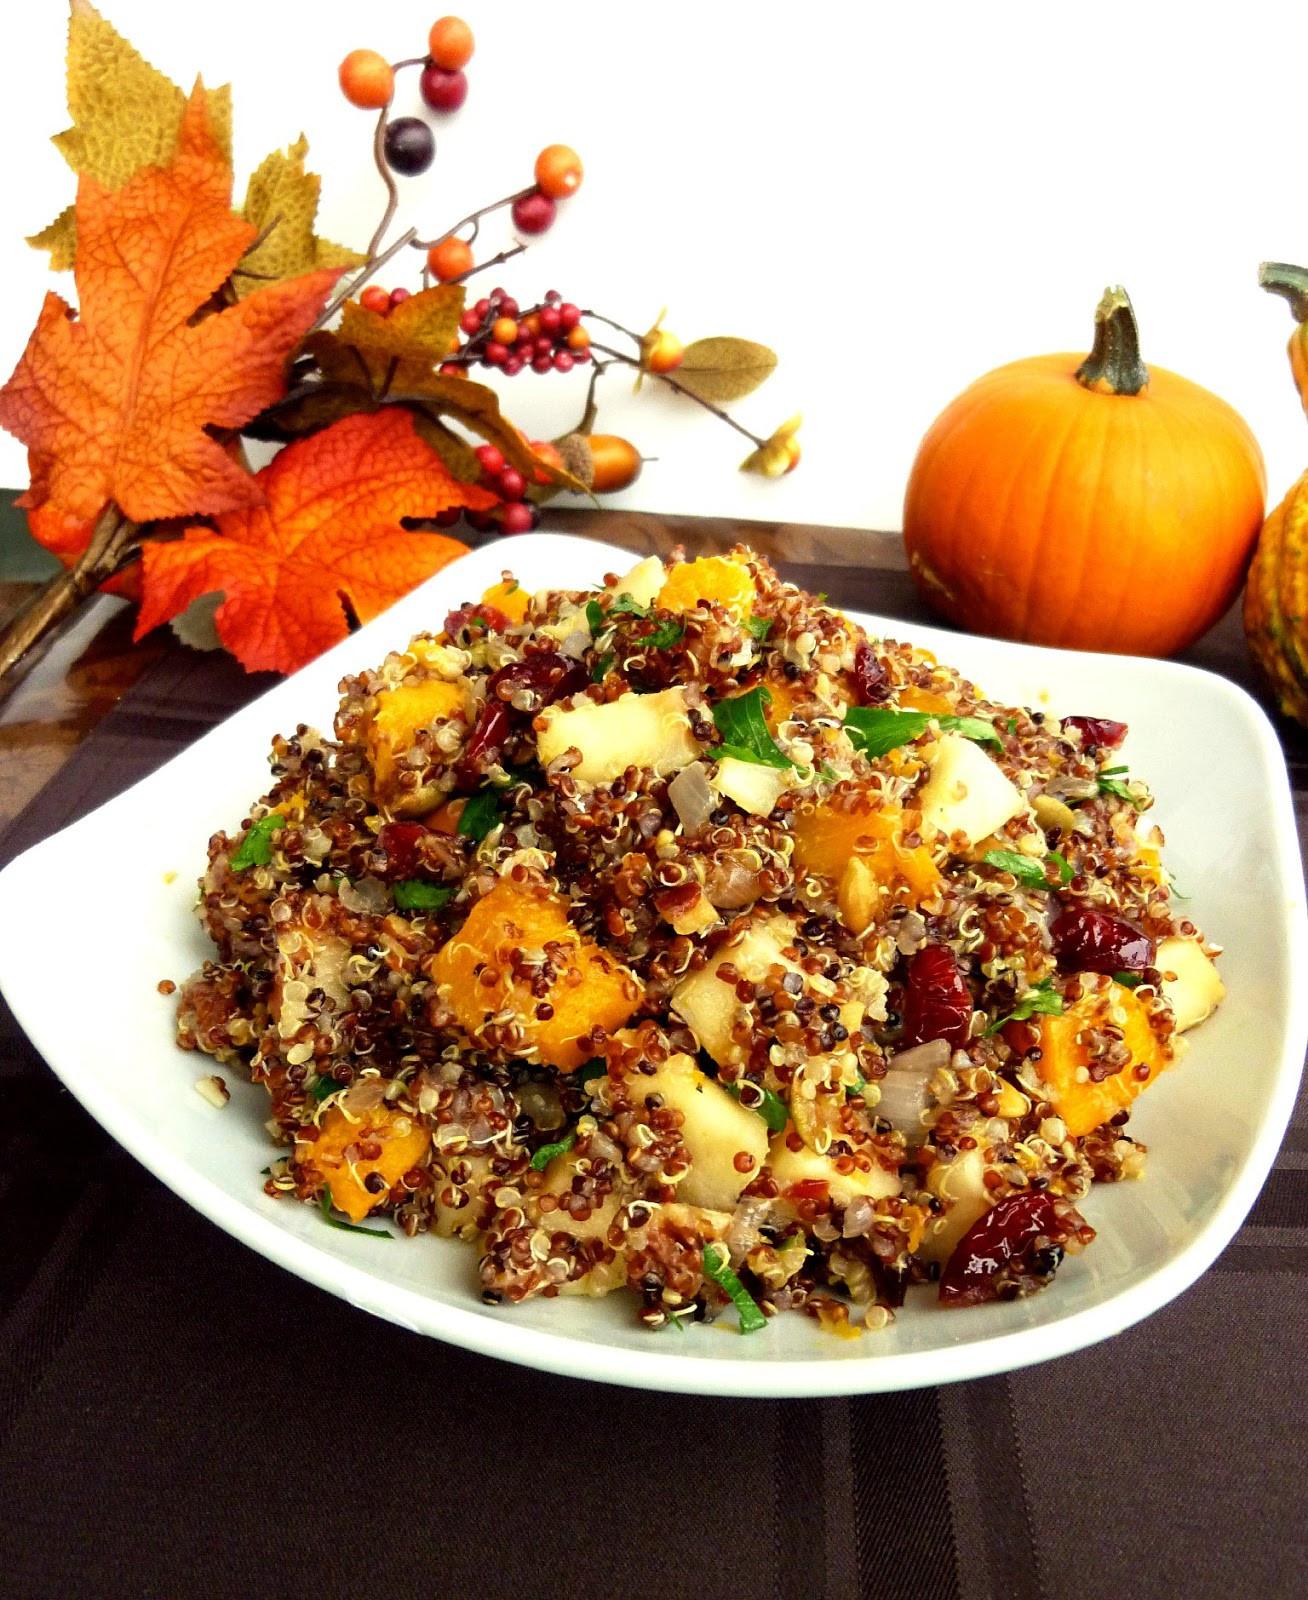 Vegetarian Main Dish Thanksgiving  Vanilla & Spice Recipes for a Ve arian Thanksgiving